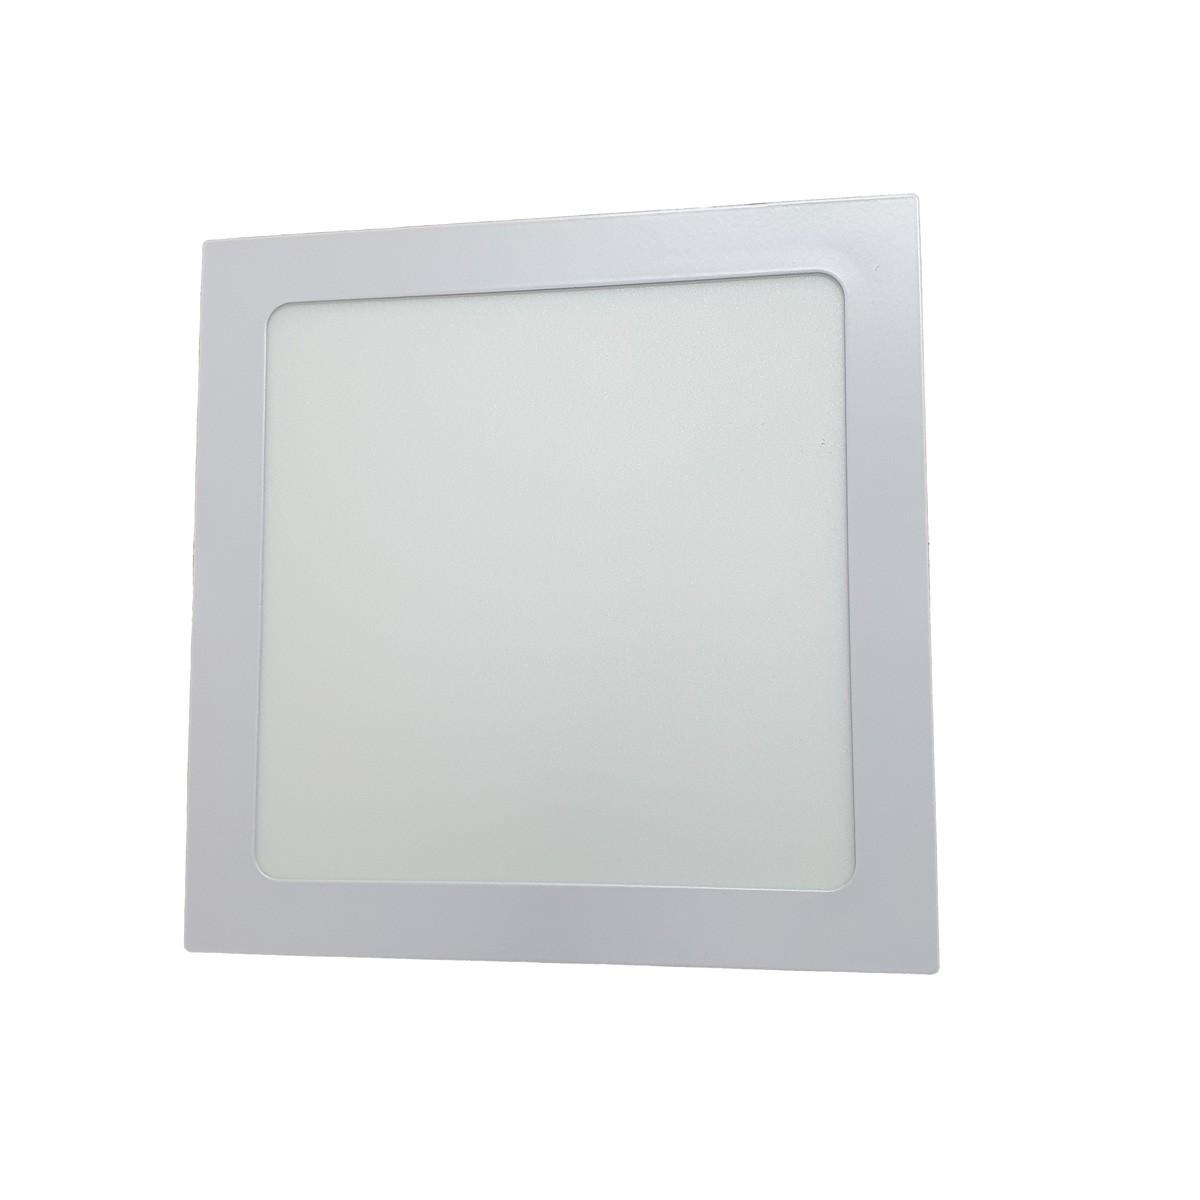 KIT 10 Painel Plafon LED 18W Quadrado Luz Branca Fria de Embutir